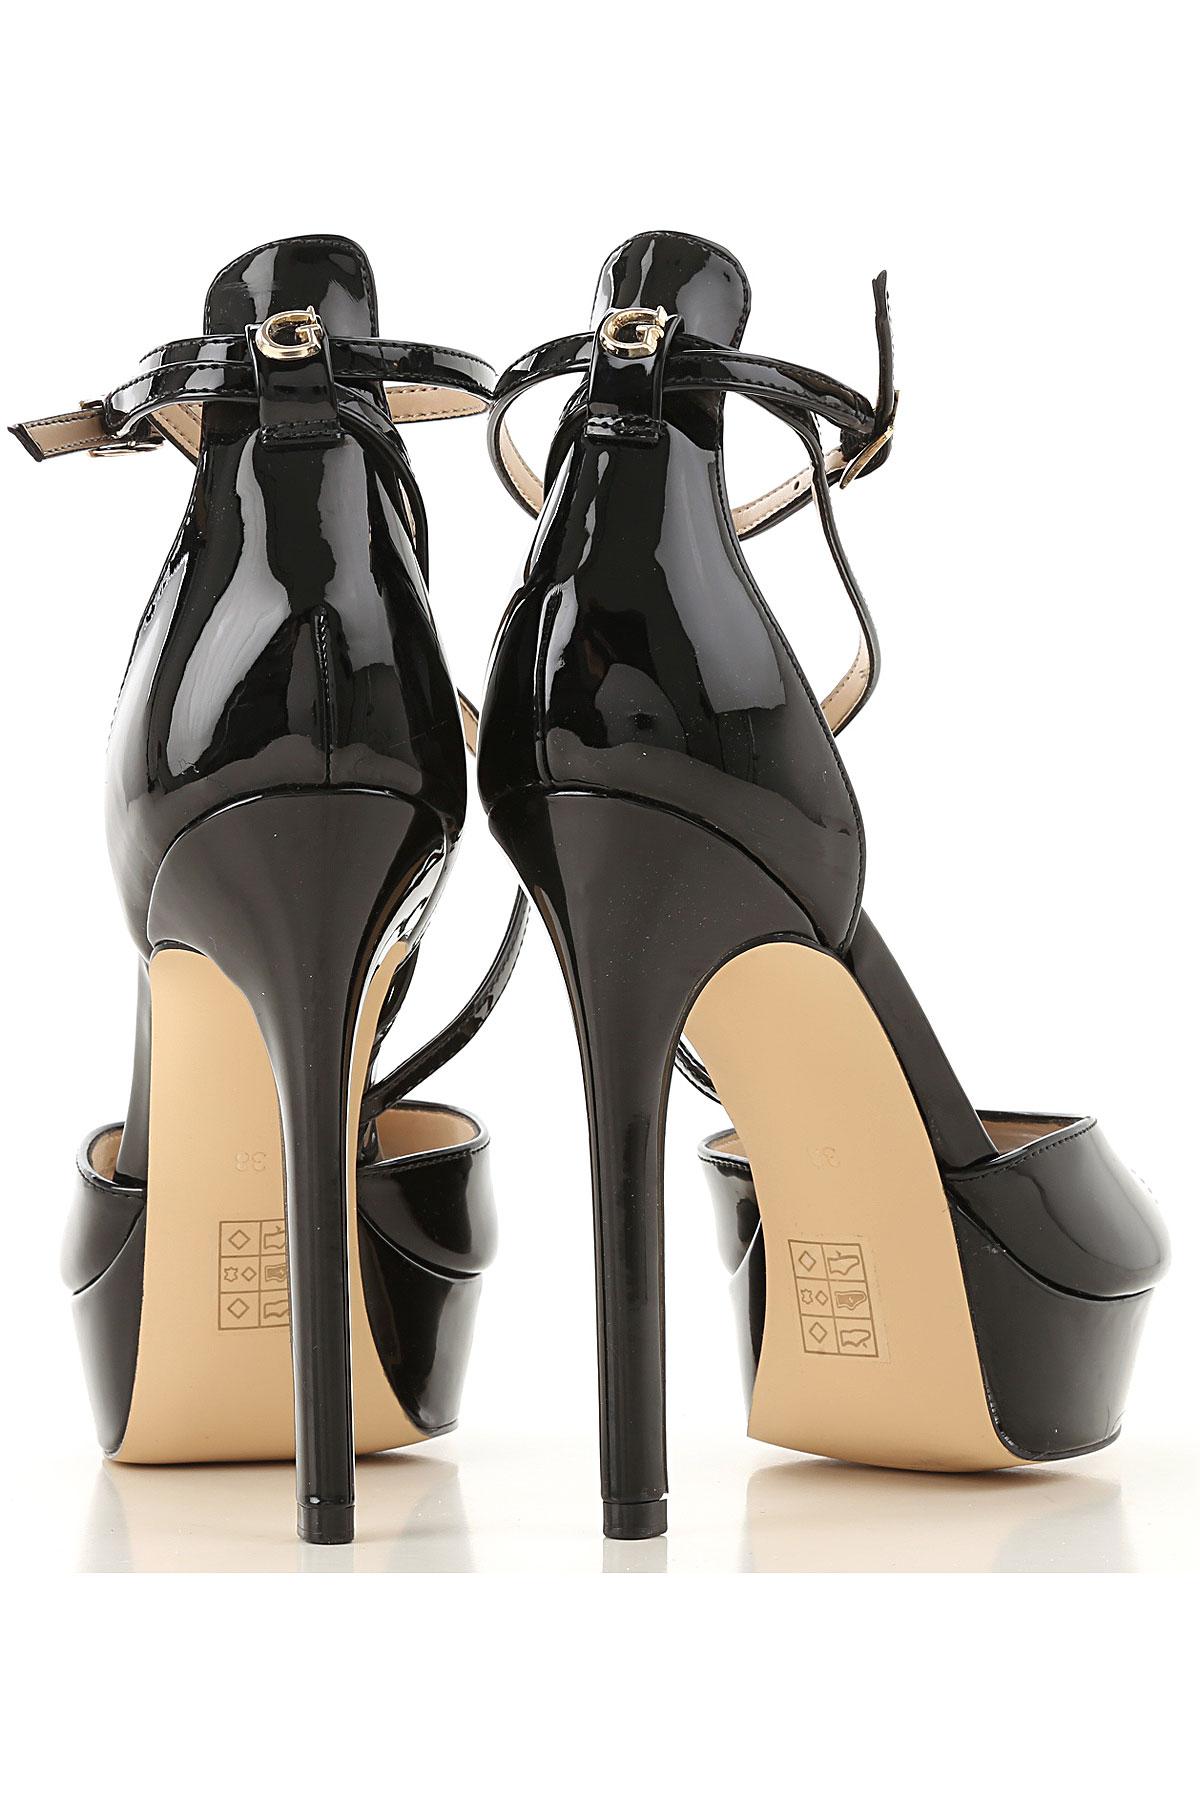 Nbsp; 2019 Pp8rb6q Mujer Guess Primavera Zapatos Para Verano Negro thxsQrdCB